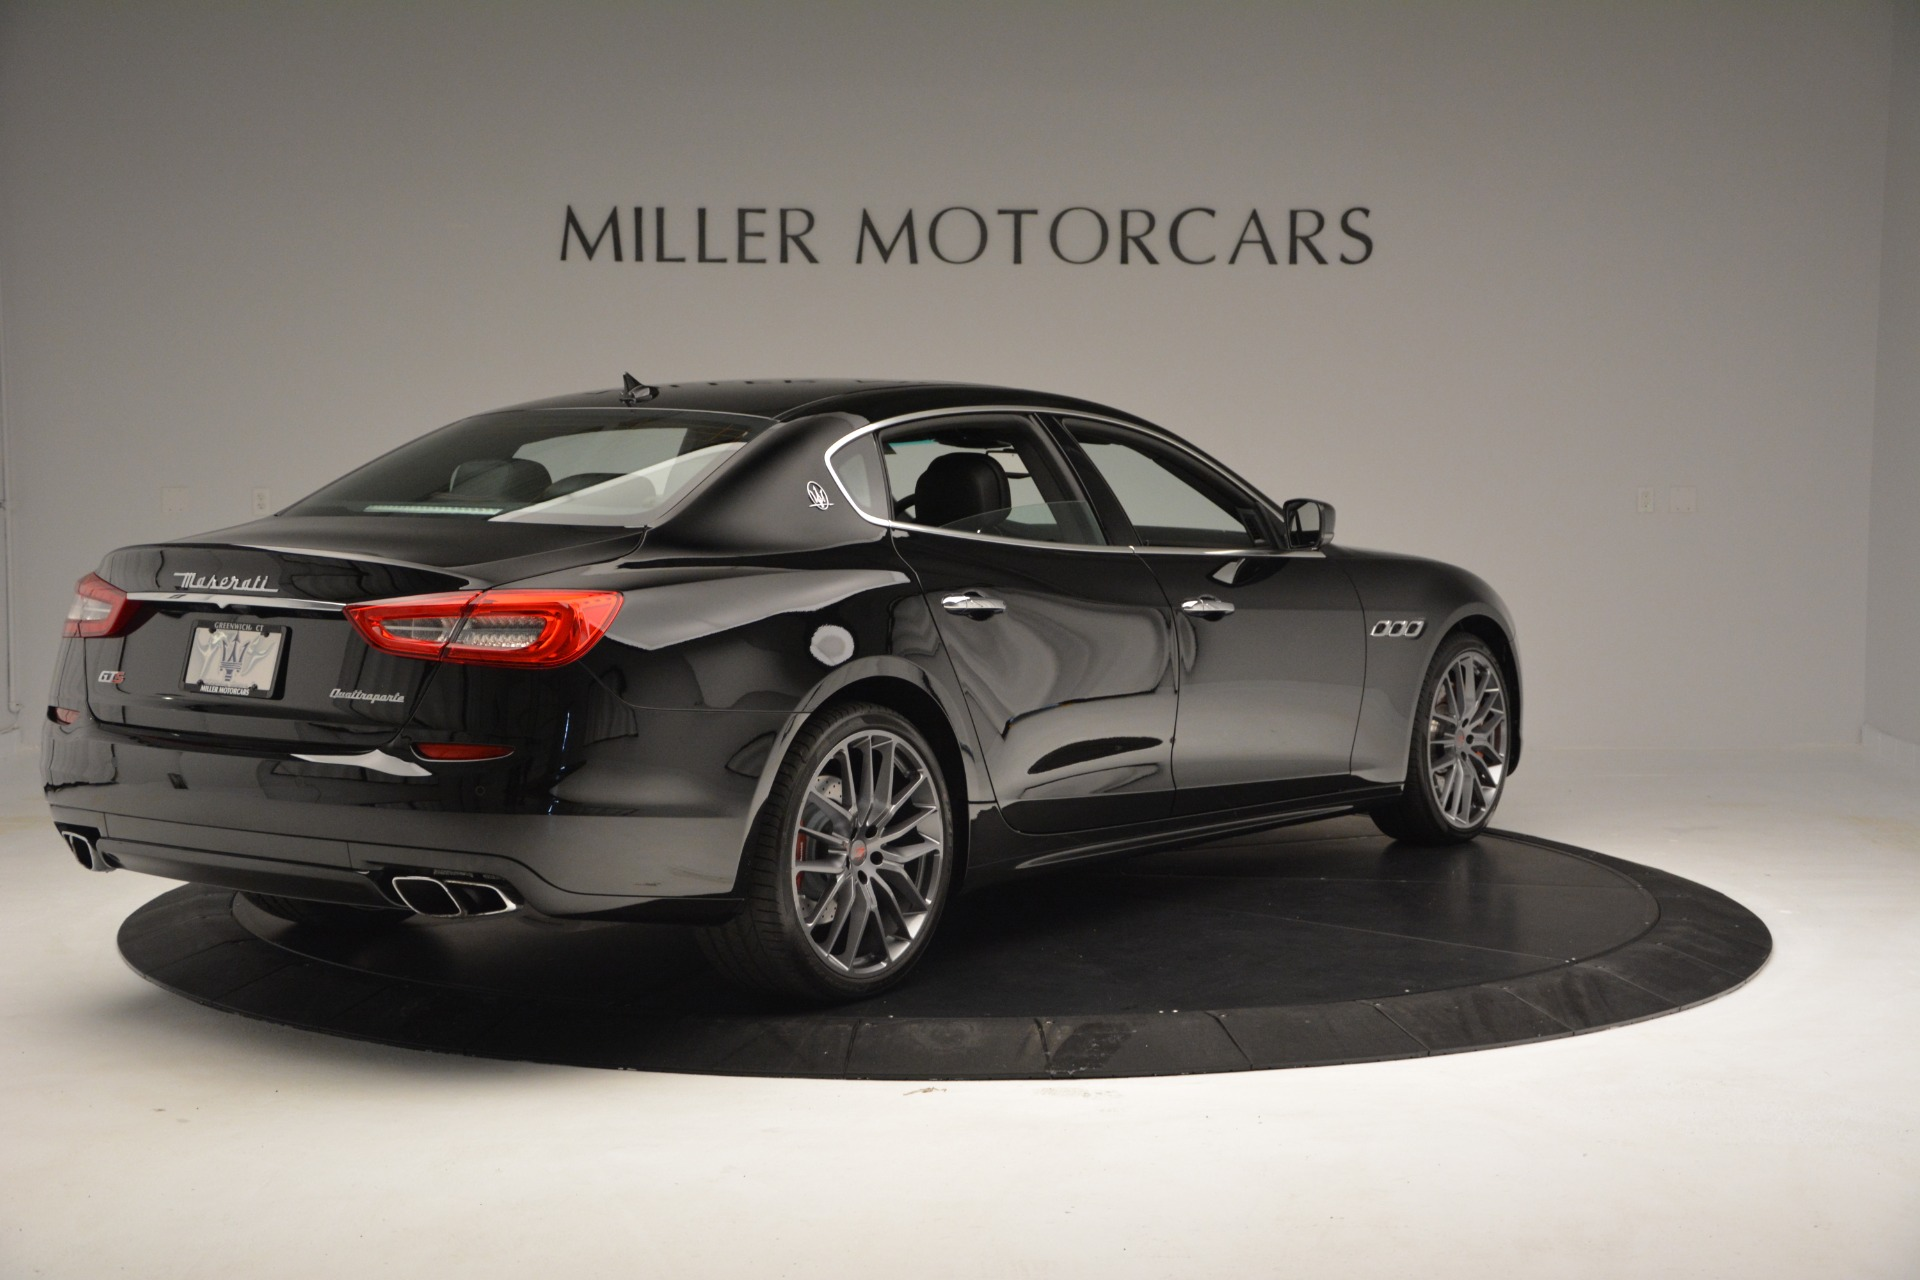 Used 2015 Maserati Quattroporte GTS For Sale In Westport, CT 2993_p7